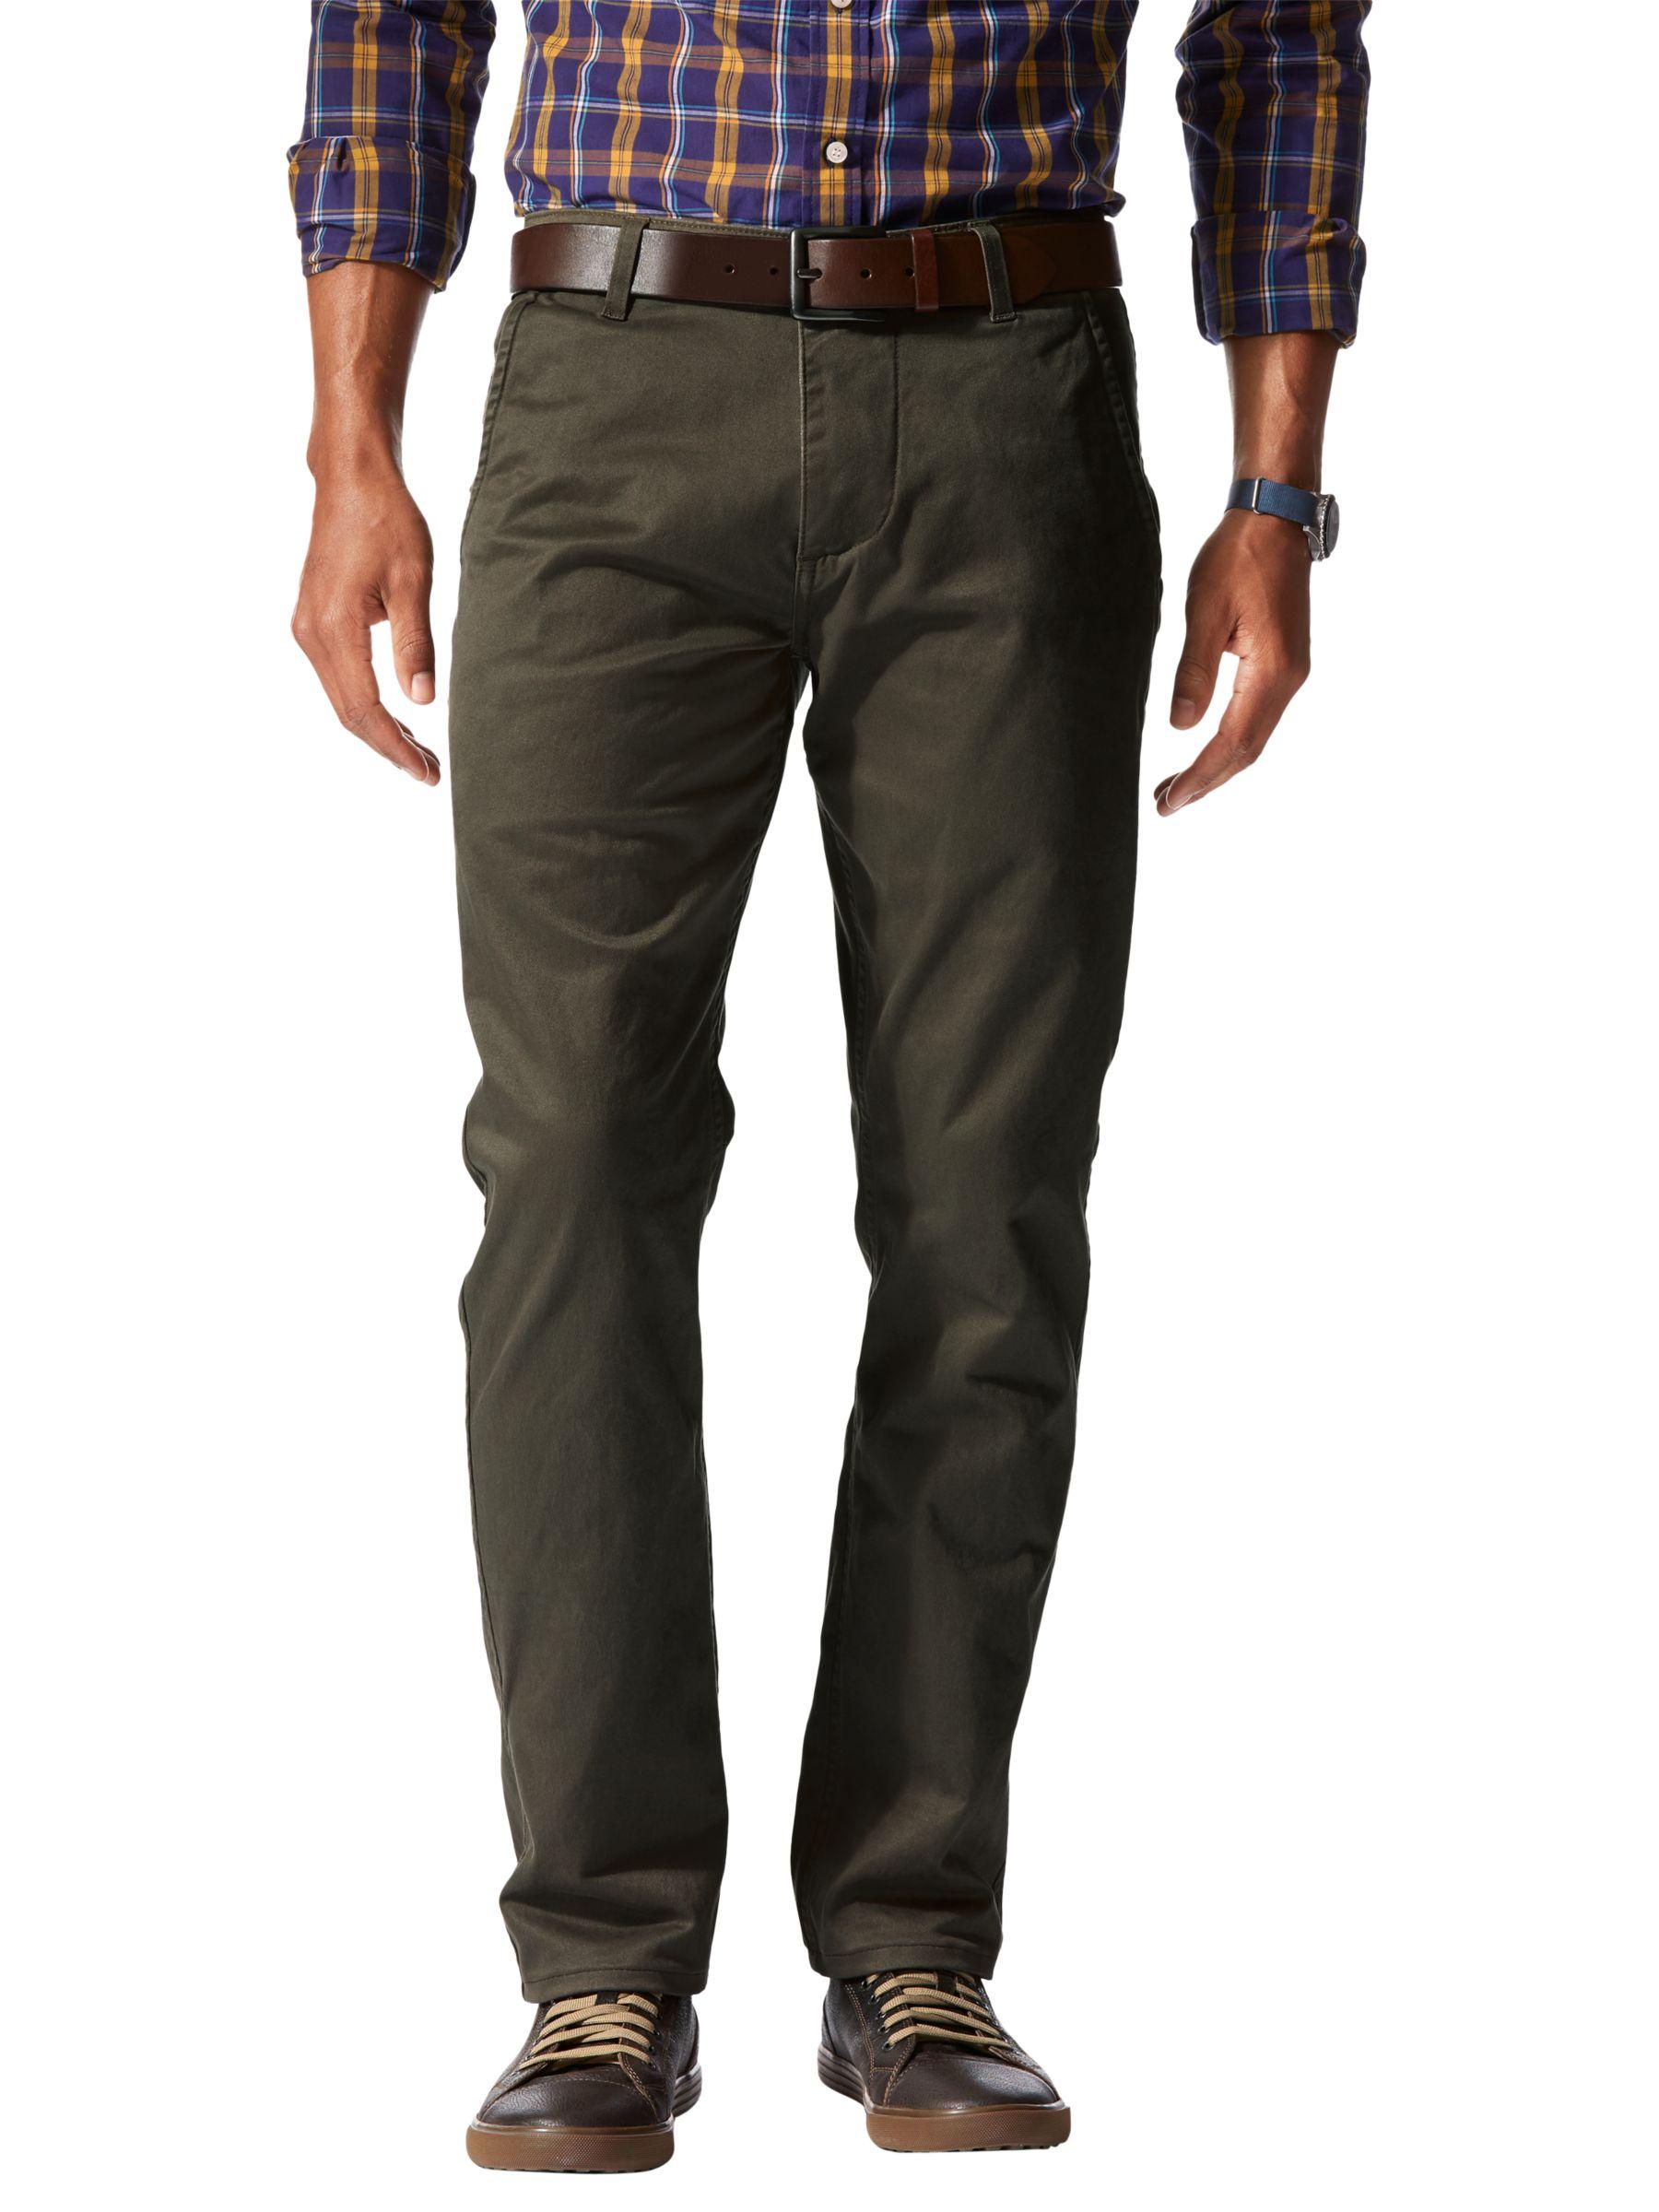 Dockers Dockers Alpha Original Slim Fit Trousers